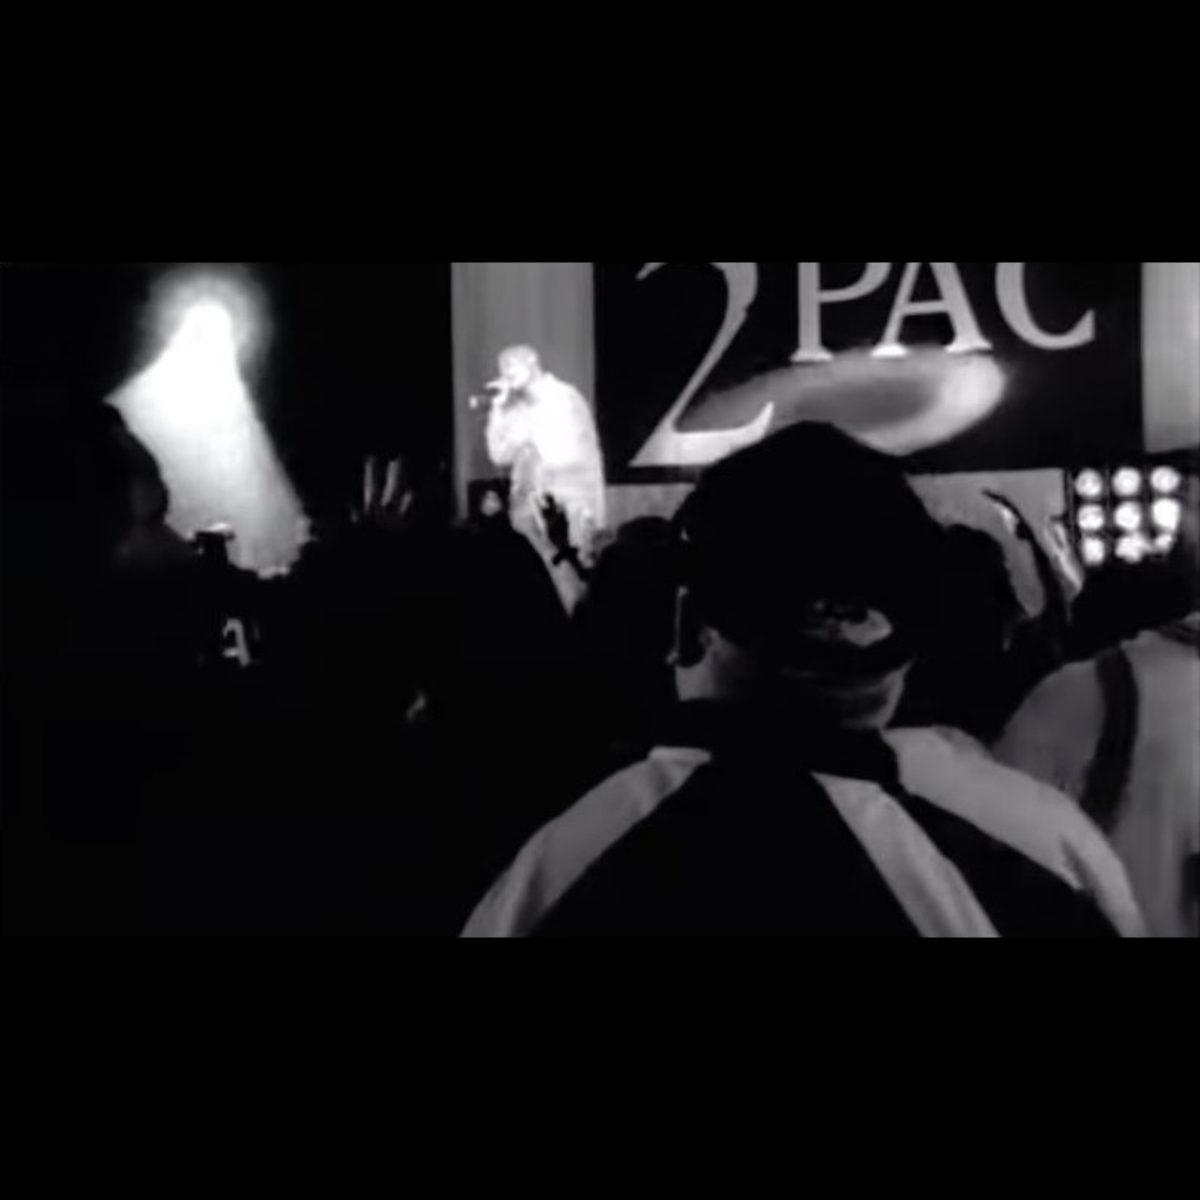 2Pac - How Do U Want It (ft. K-Ci and JoJo) (Concert Version) (Thumbnail)